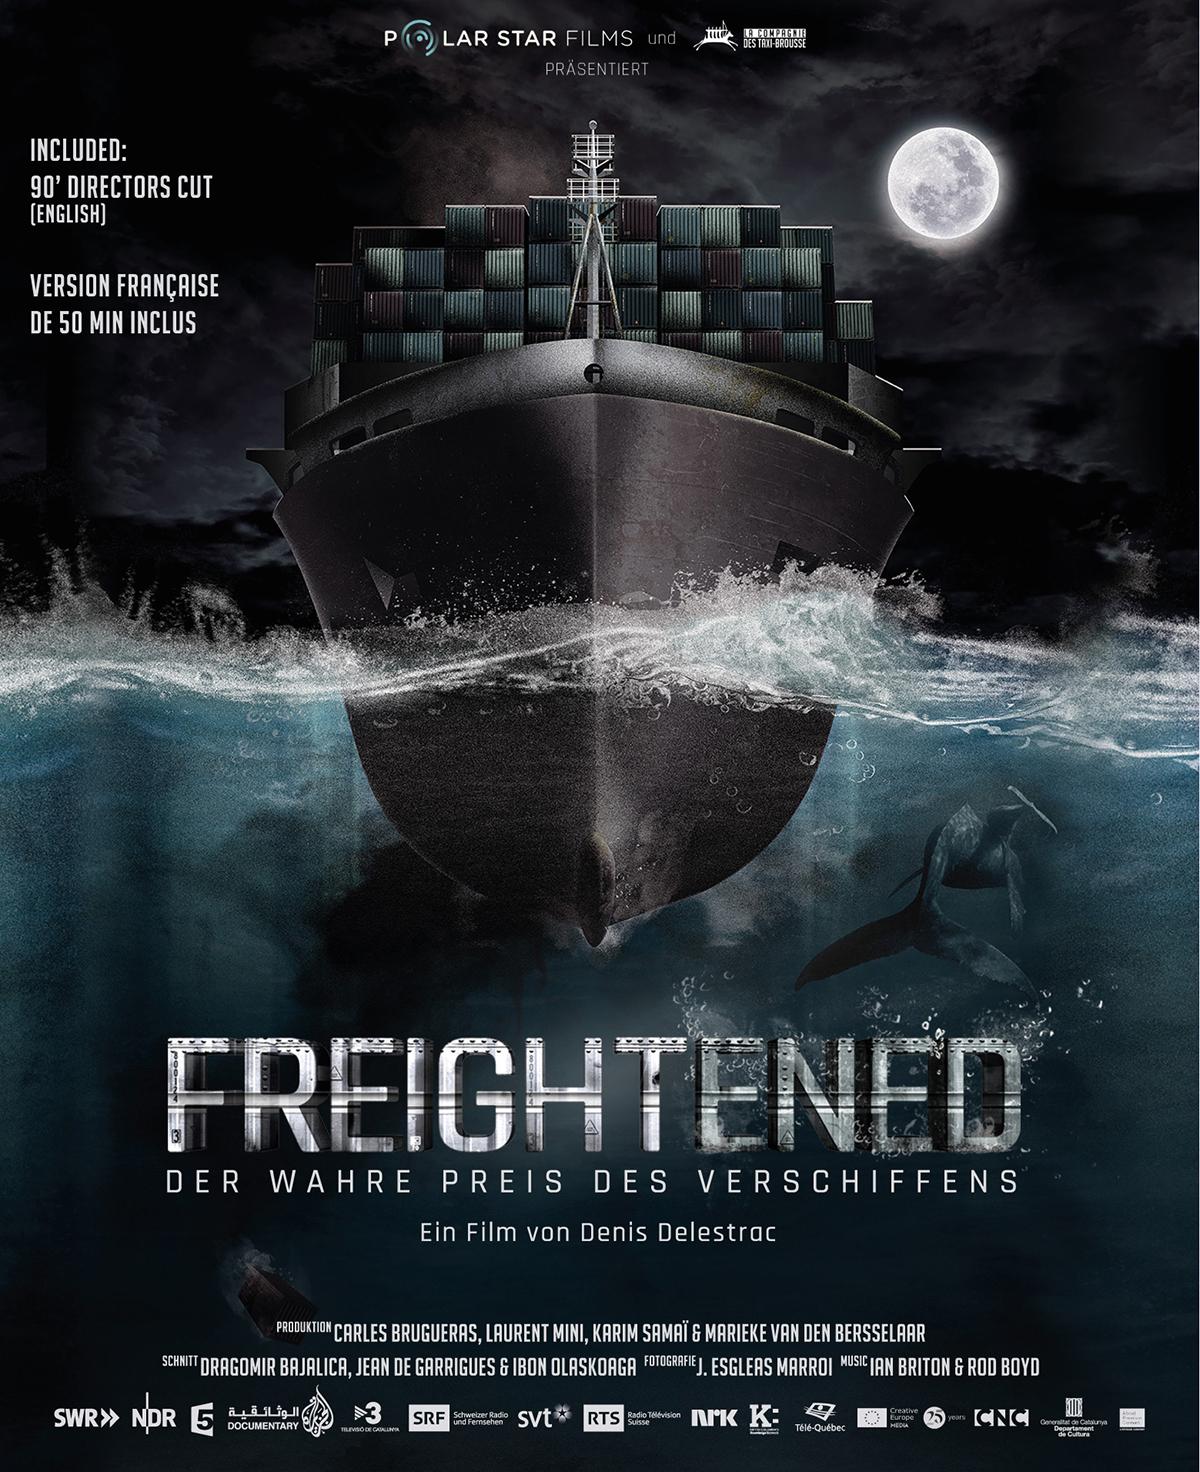 2019-12-12 seeblind freightened plakat